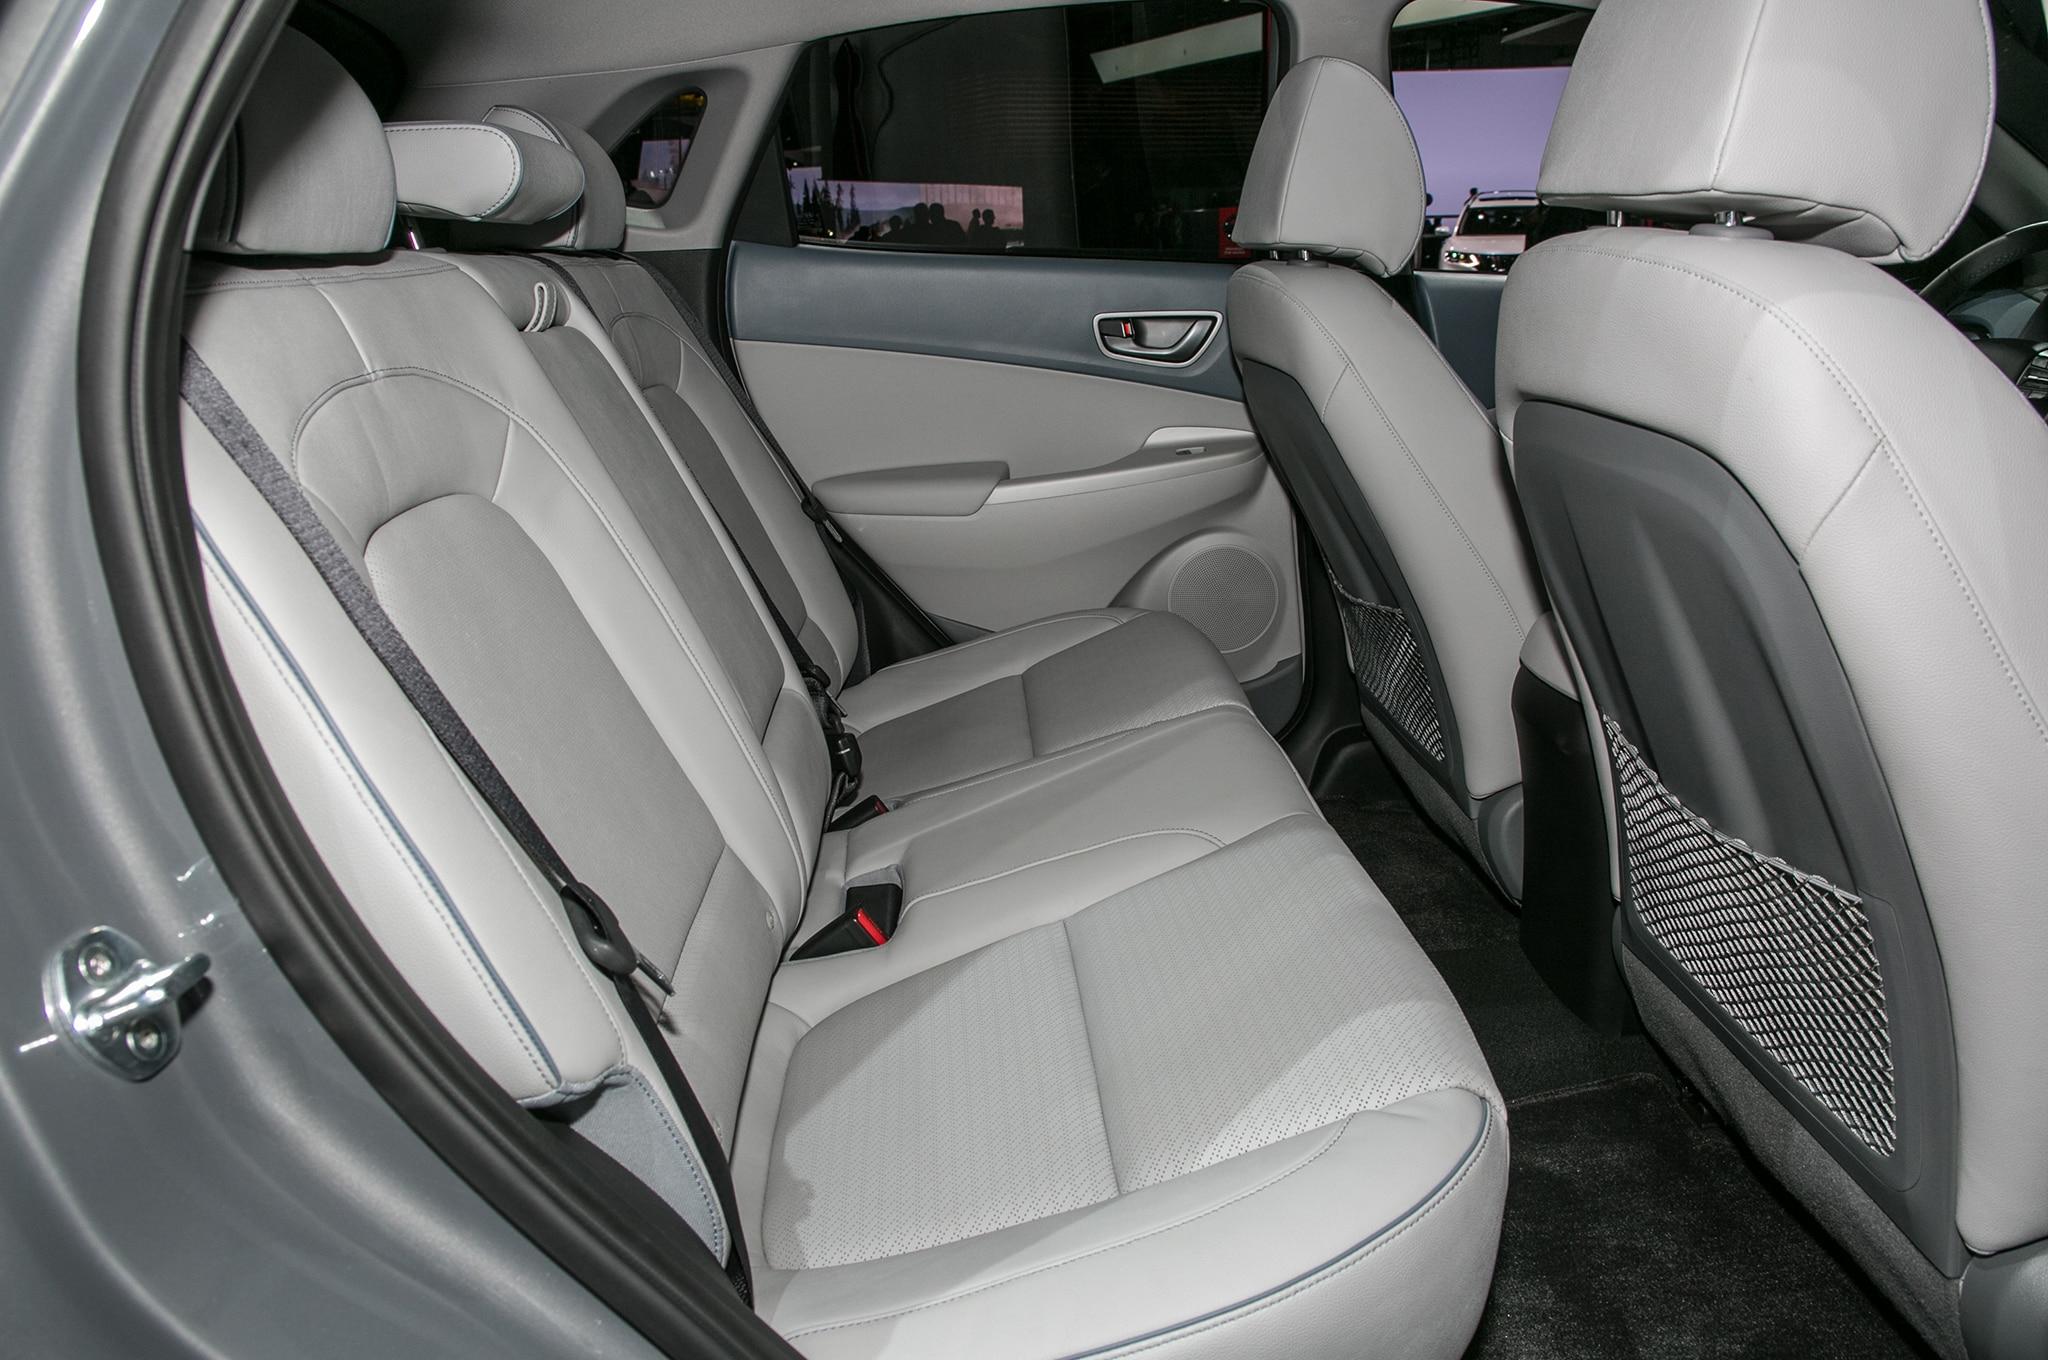 Hyundai Kona 2019 Interieur